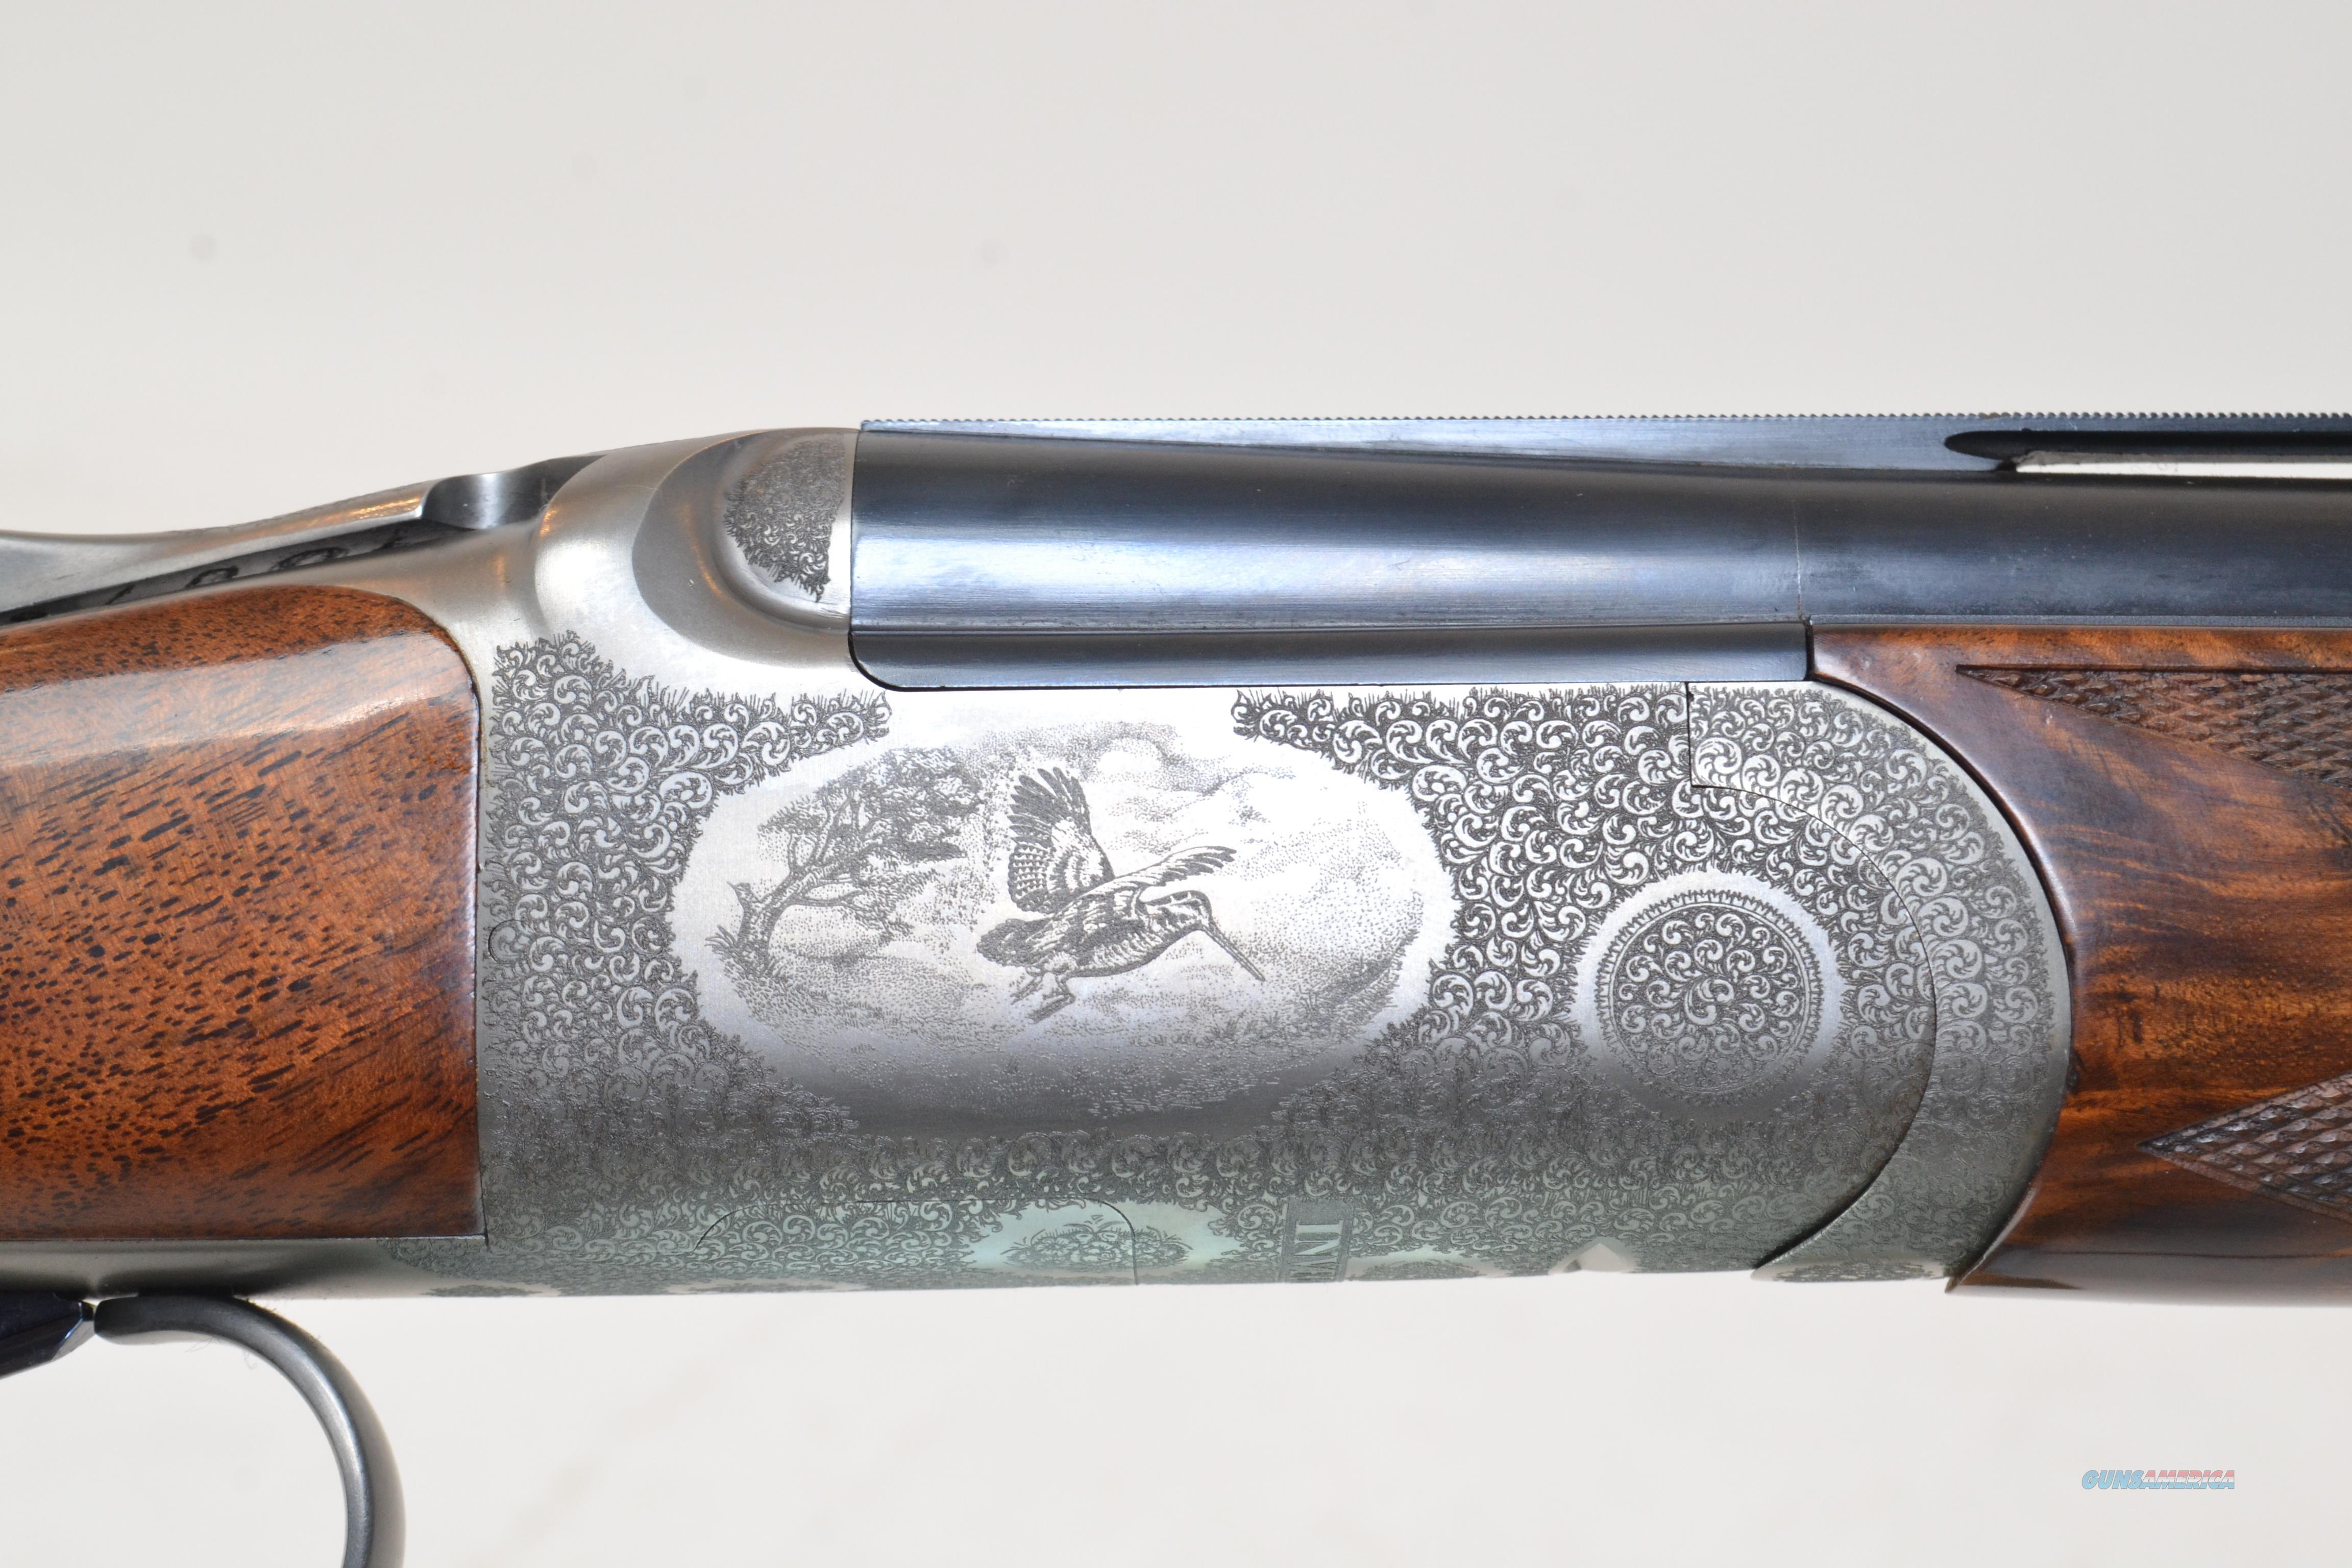 "CSMC - Christian Hunter, Special, Round Body, O/U, 20ga. 28"" barrels  Guns > Shotguns > Connecticut (Galazan) Shotguns"